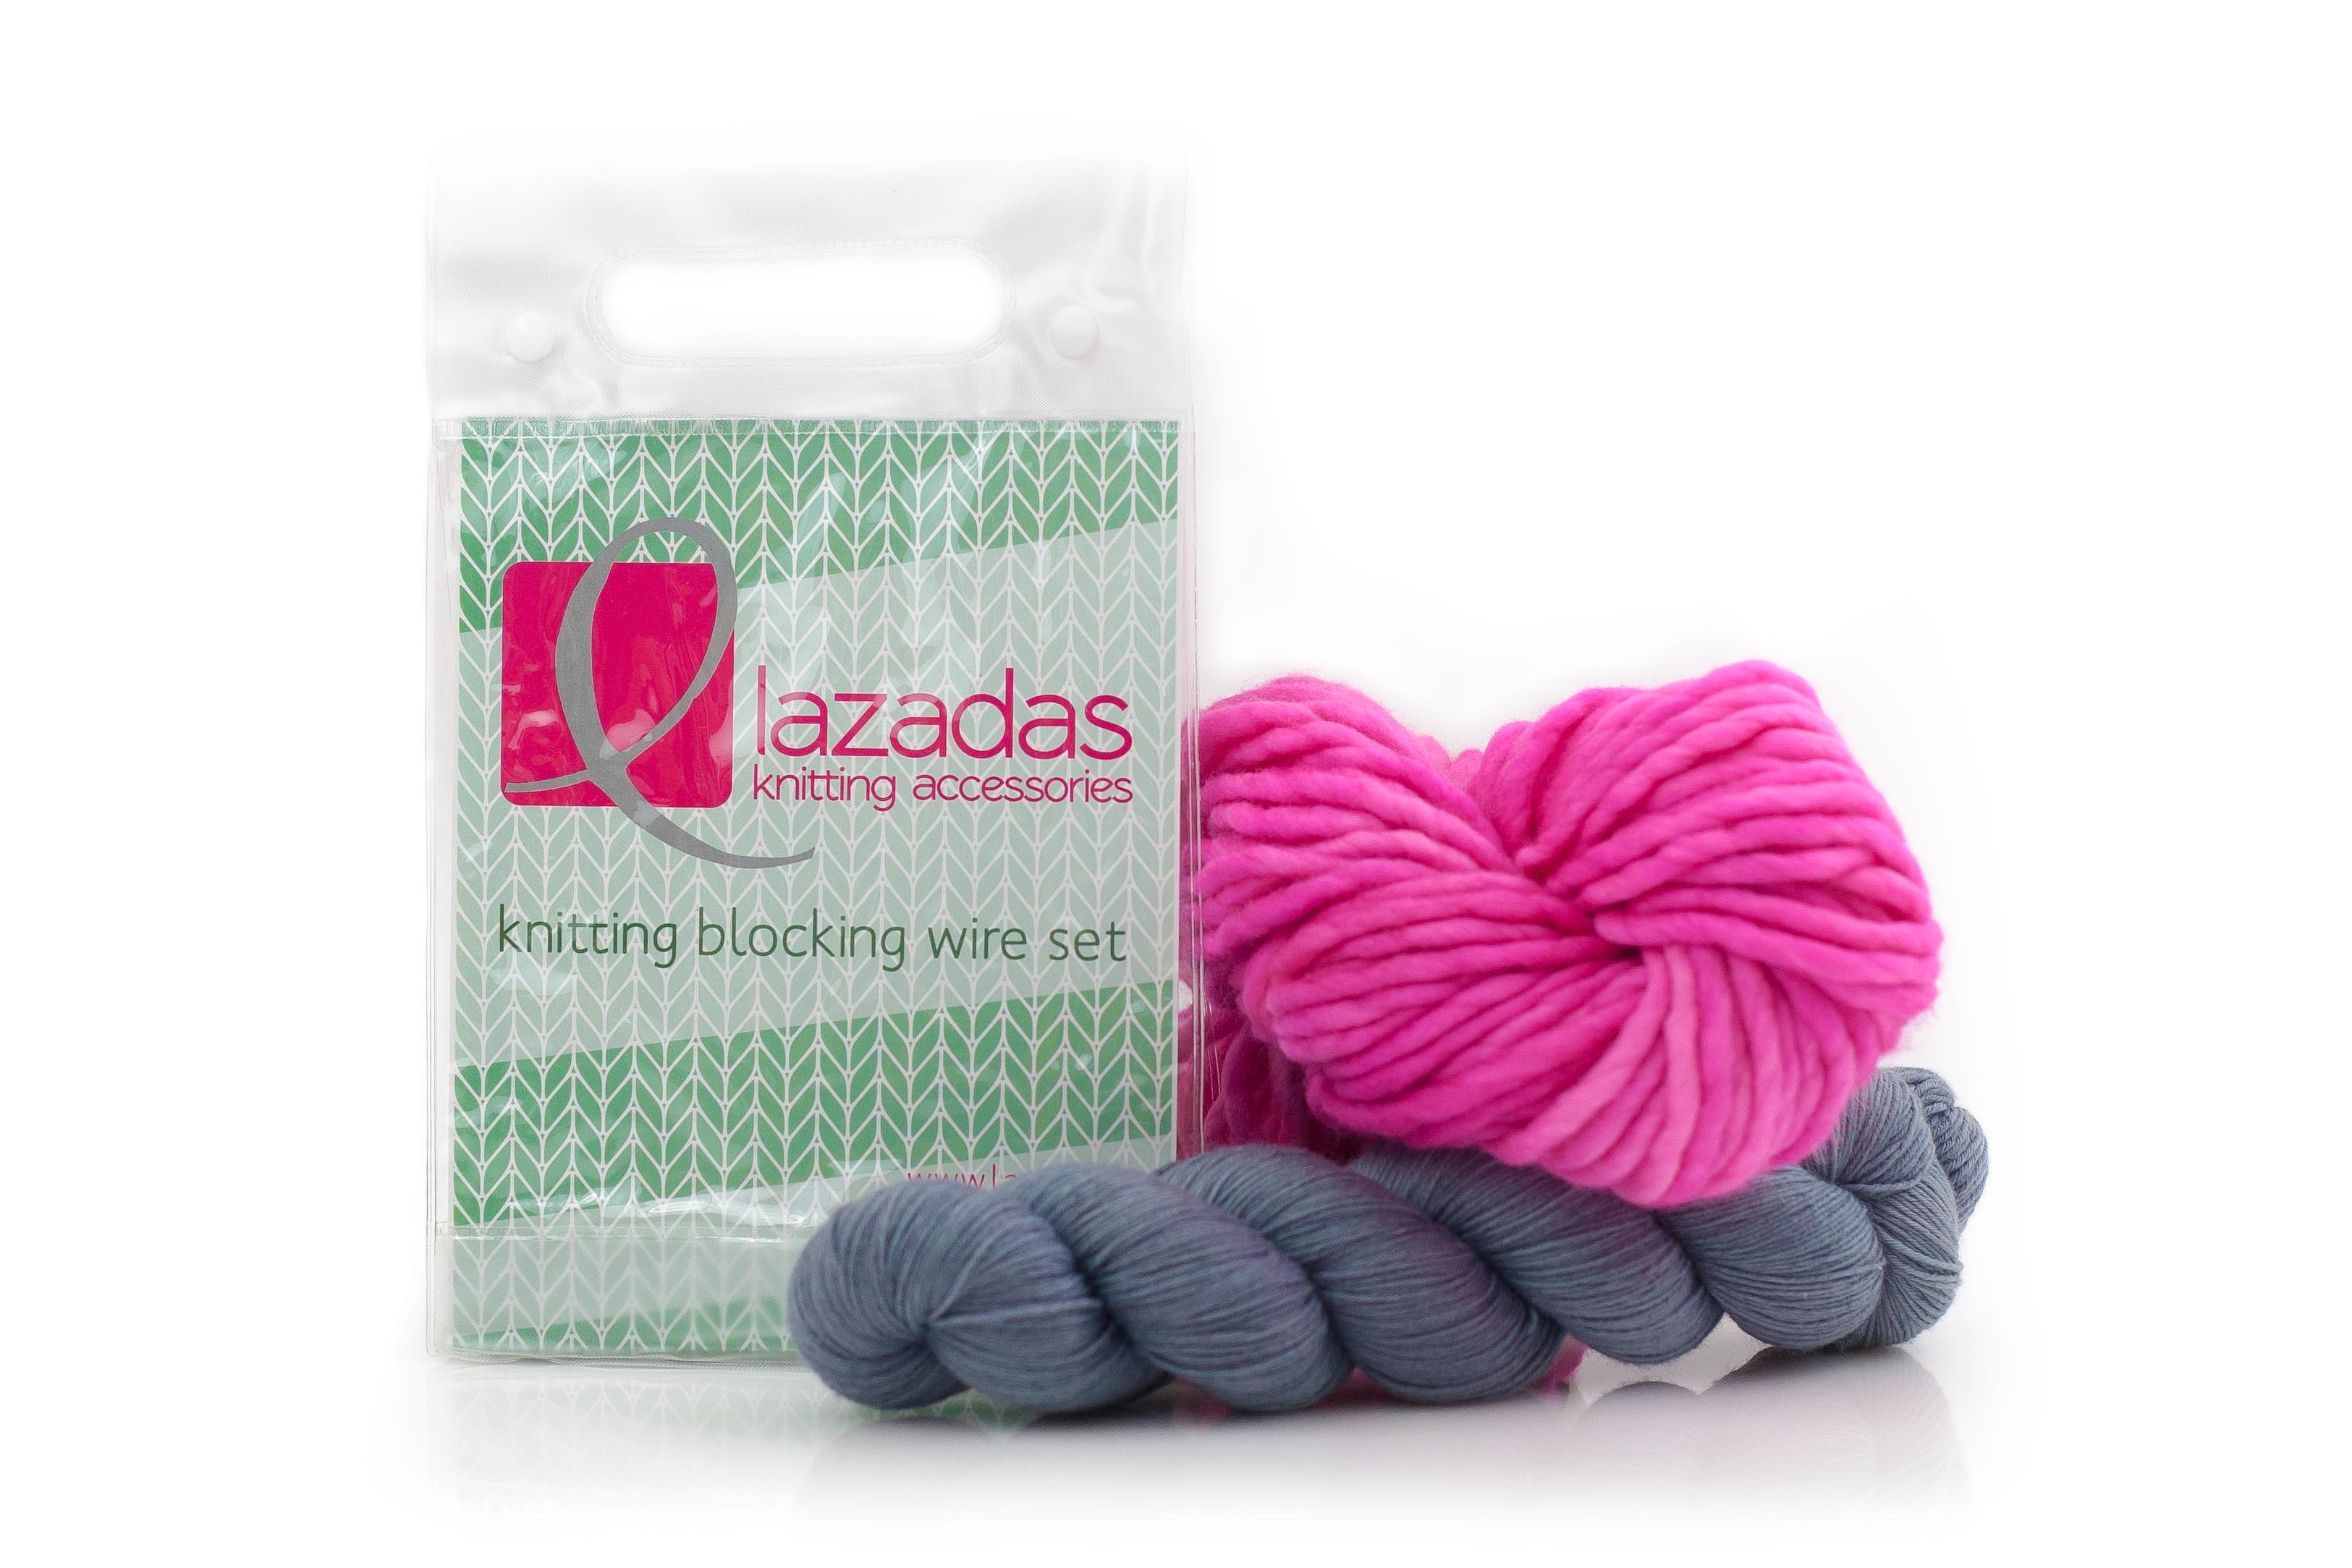 Super Flexible Blocking Wire Set At Lazadas Net With Images Blocking Wires Knitting Help Knitting Blocking